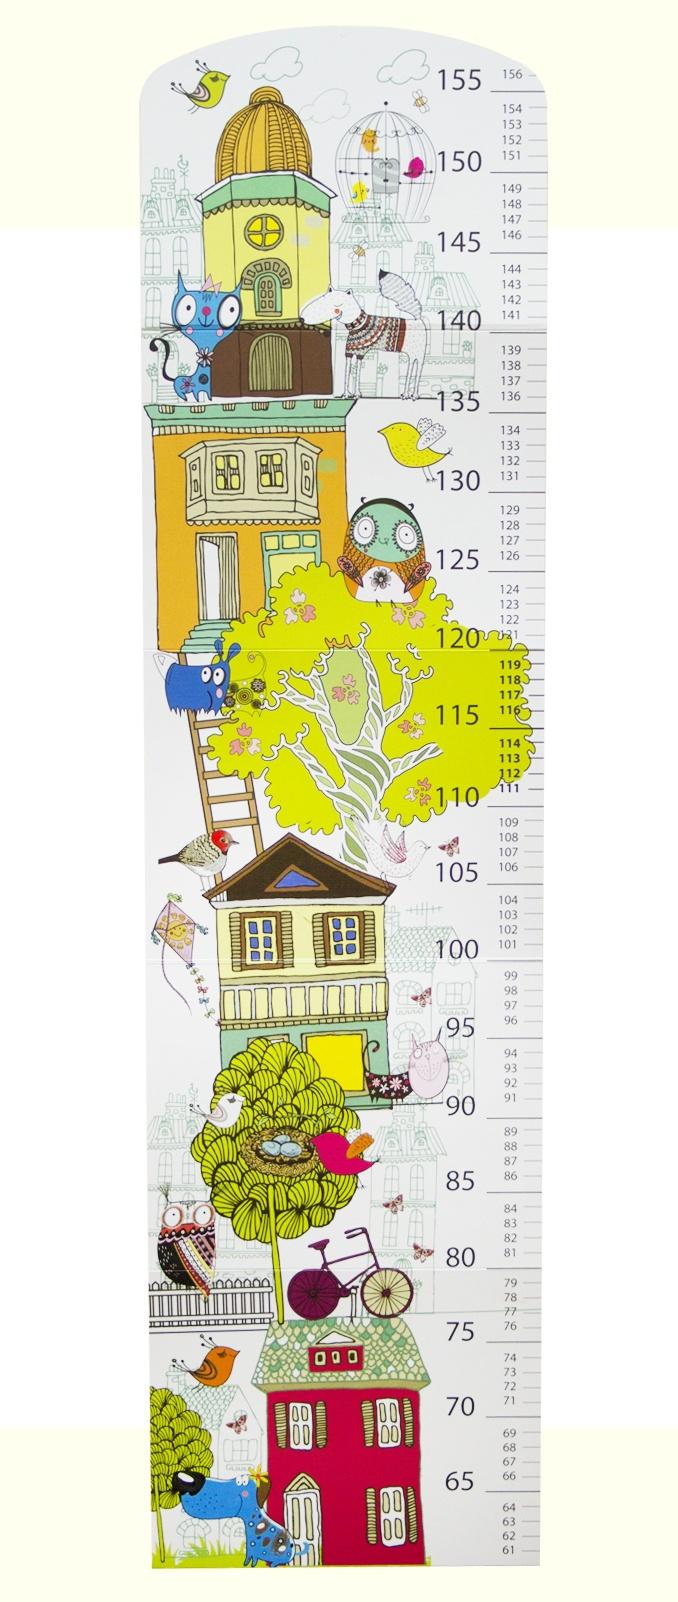 Ростомер Family Treasures, 8087, белый цена